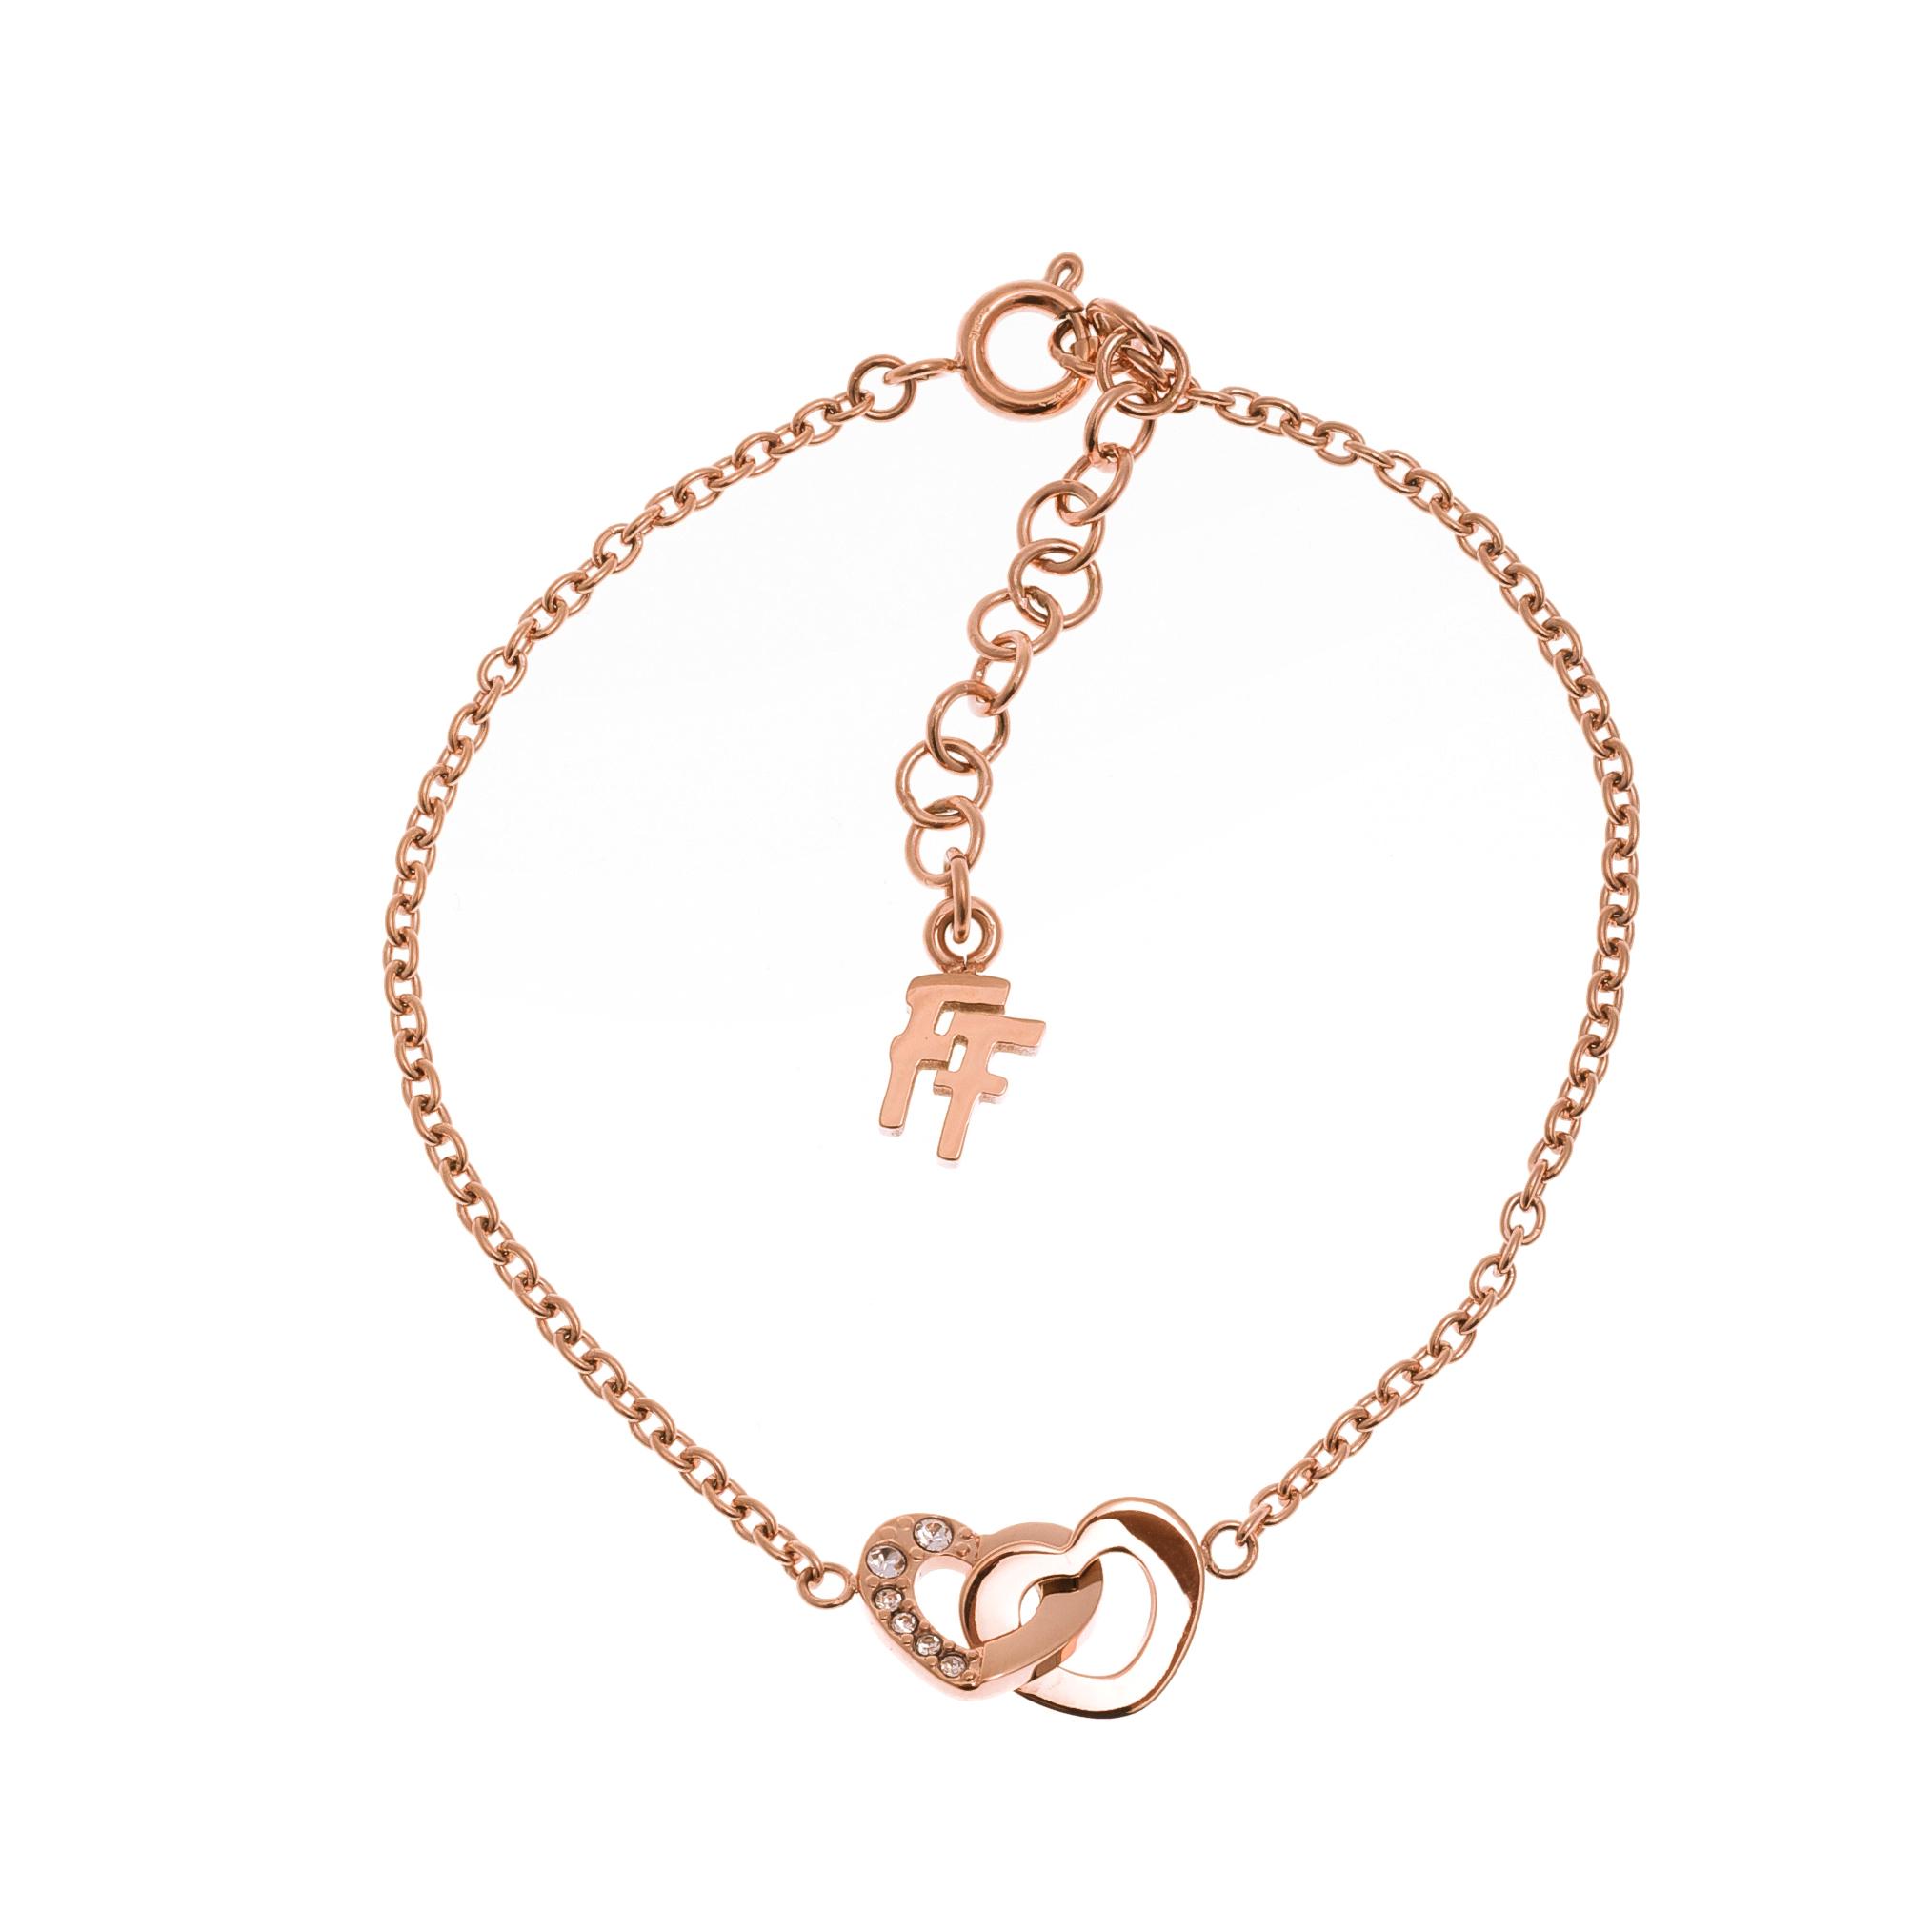 FOLLI FOLLIE - Βραχιόλι FOLLI FOLLIE γυναικεία αξεσουάρ κοσμήματα βραχιόλια